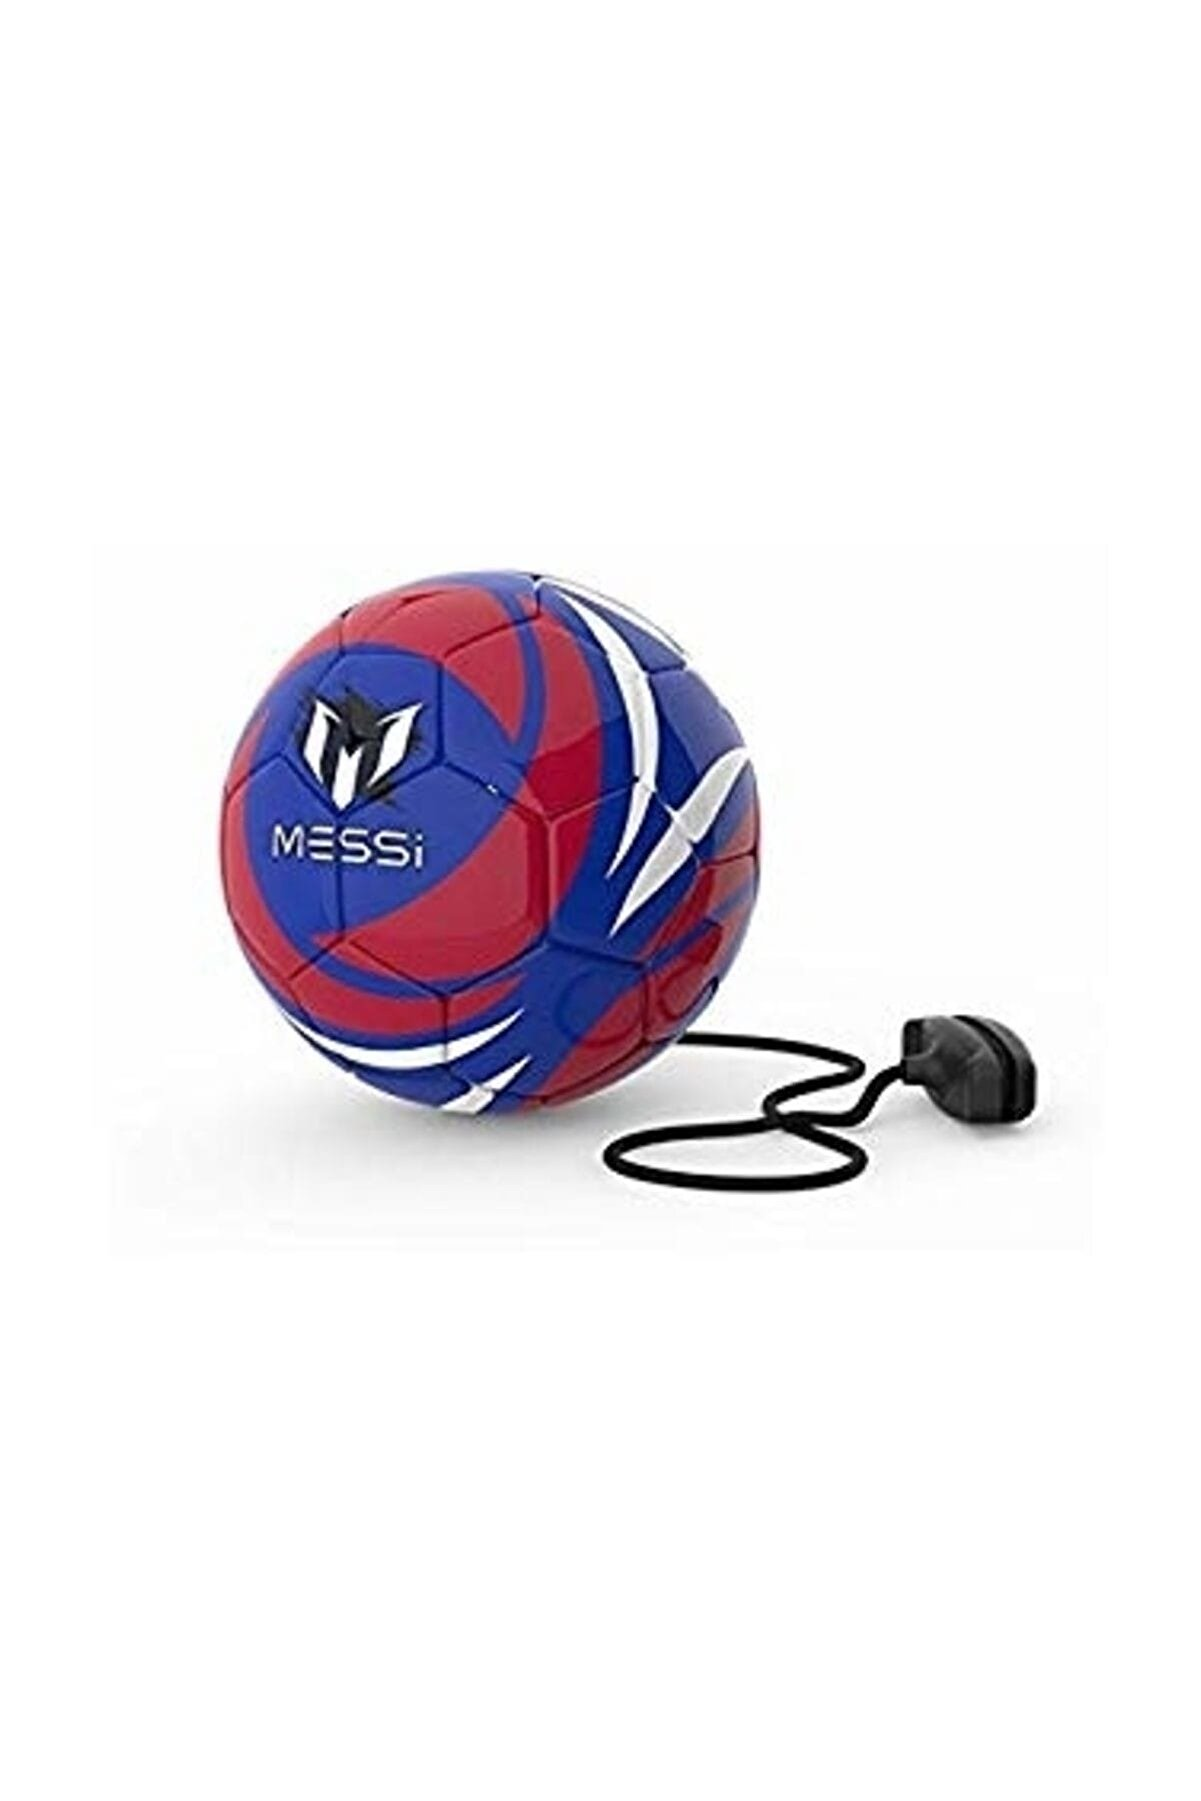 Diger Karakterler Messi Yumuşak Dokunuş Antreman Topu - Kırmızı